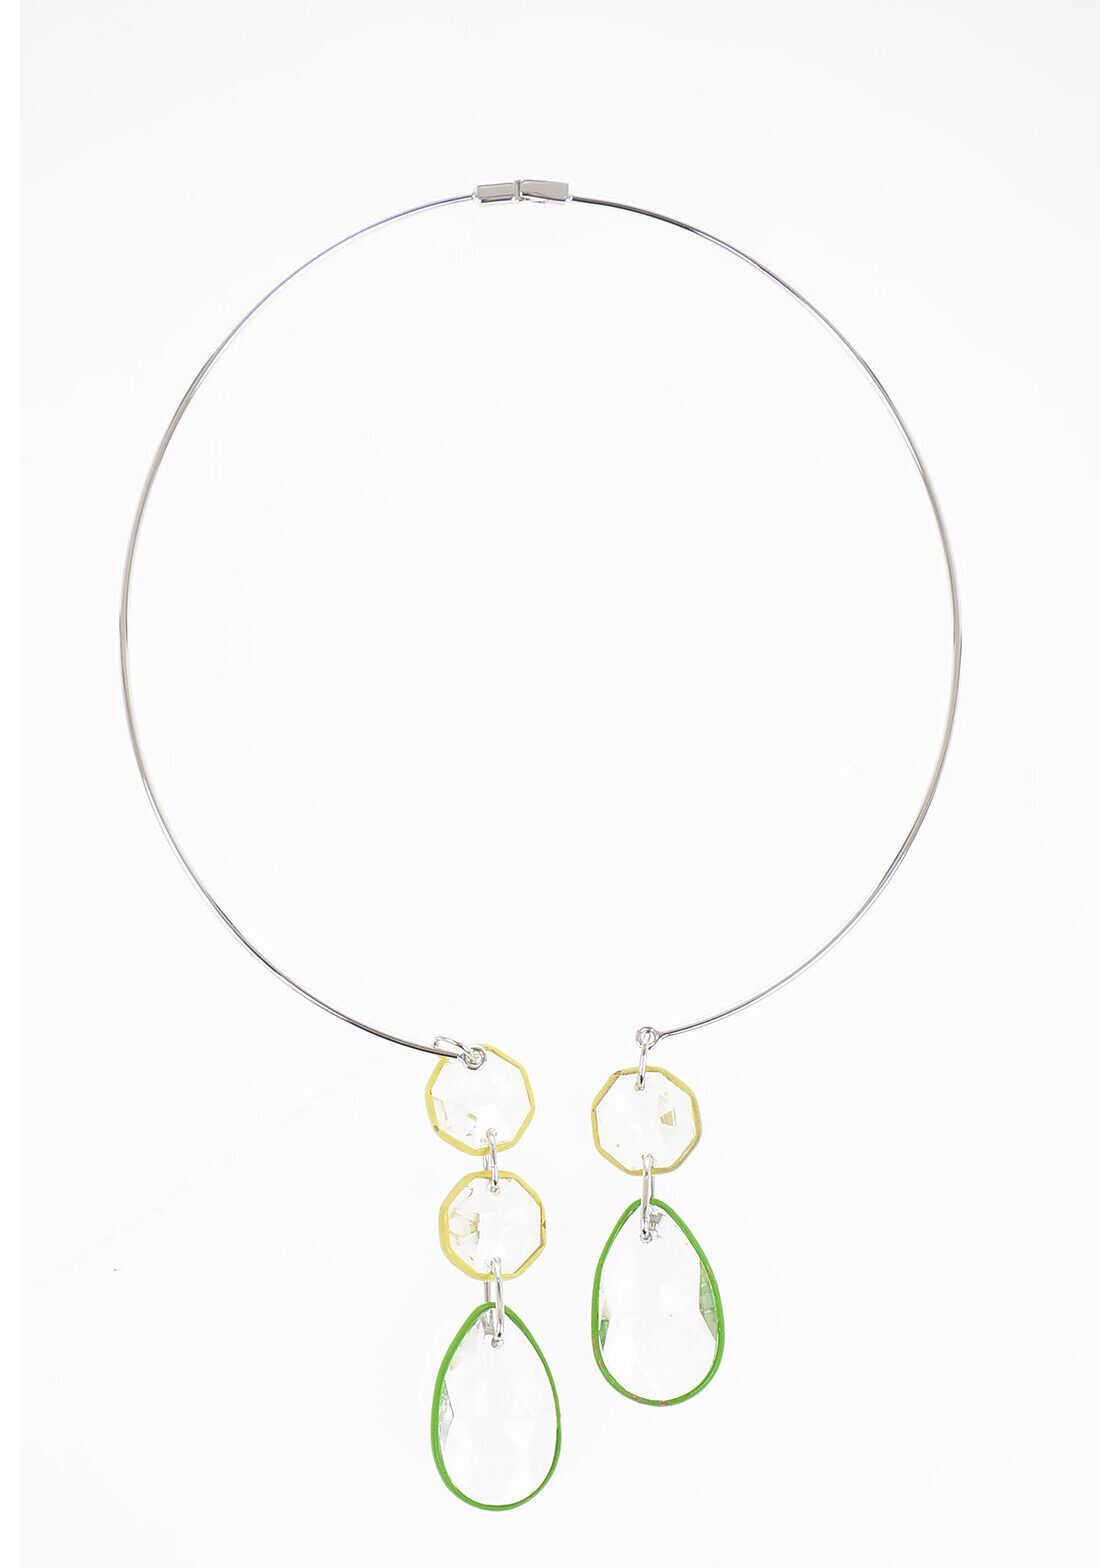 Maison Margiela MM11 Necklace with Pendant SILVER